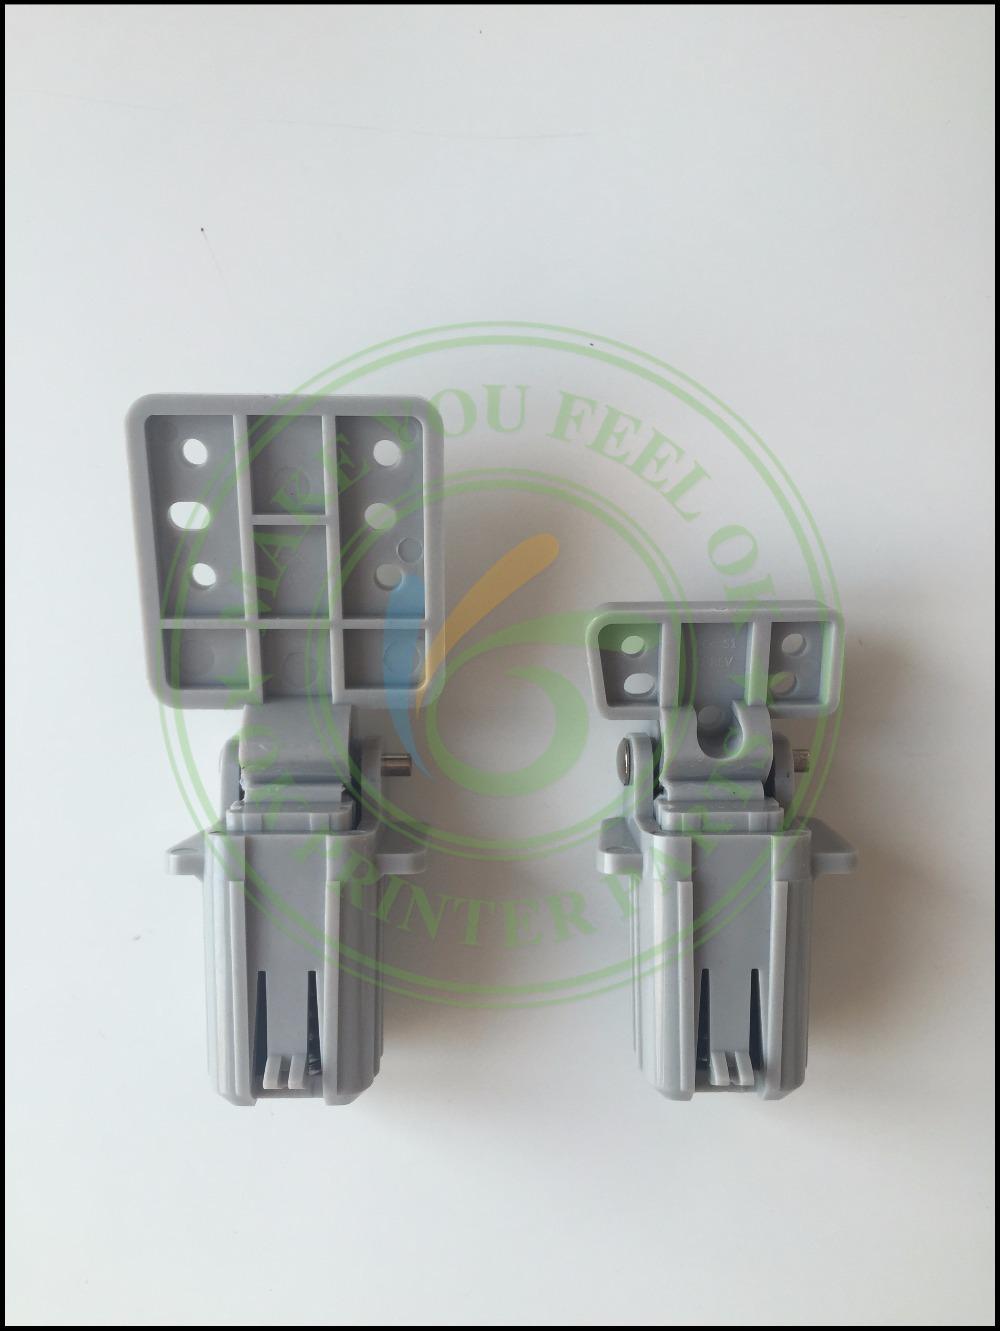 NEW Q3948-67905 Q394867905 ADF Assembly Hinge Kit for HP CM2320 2820 2830 2840 CM1312 3390 3392 M2727(China (Mainland))